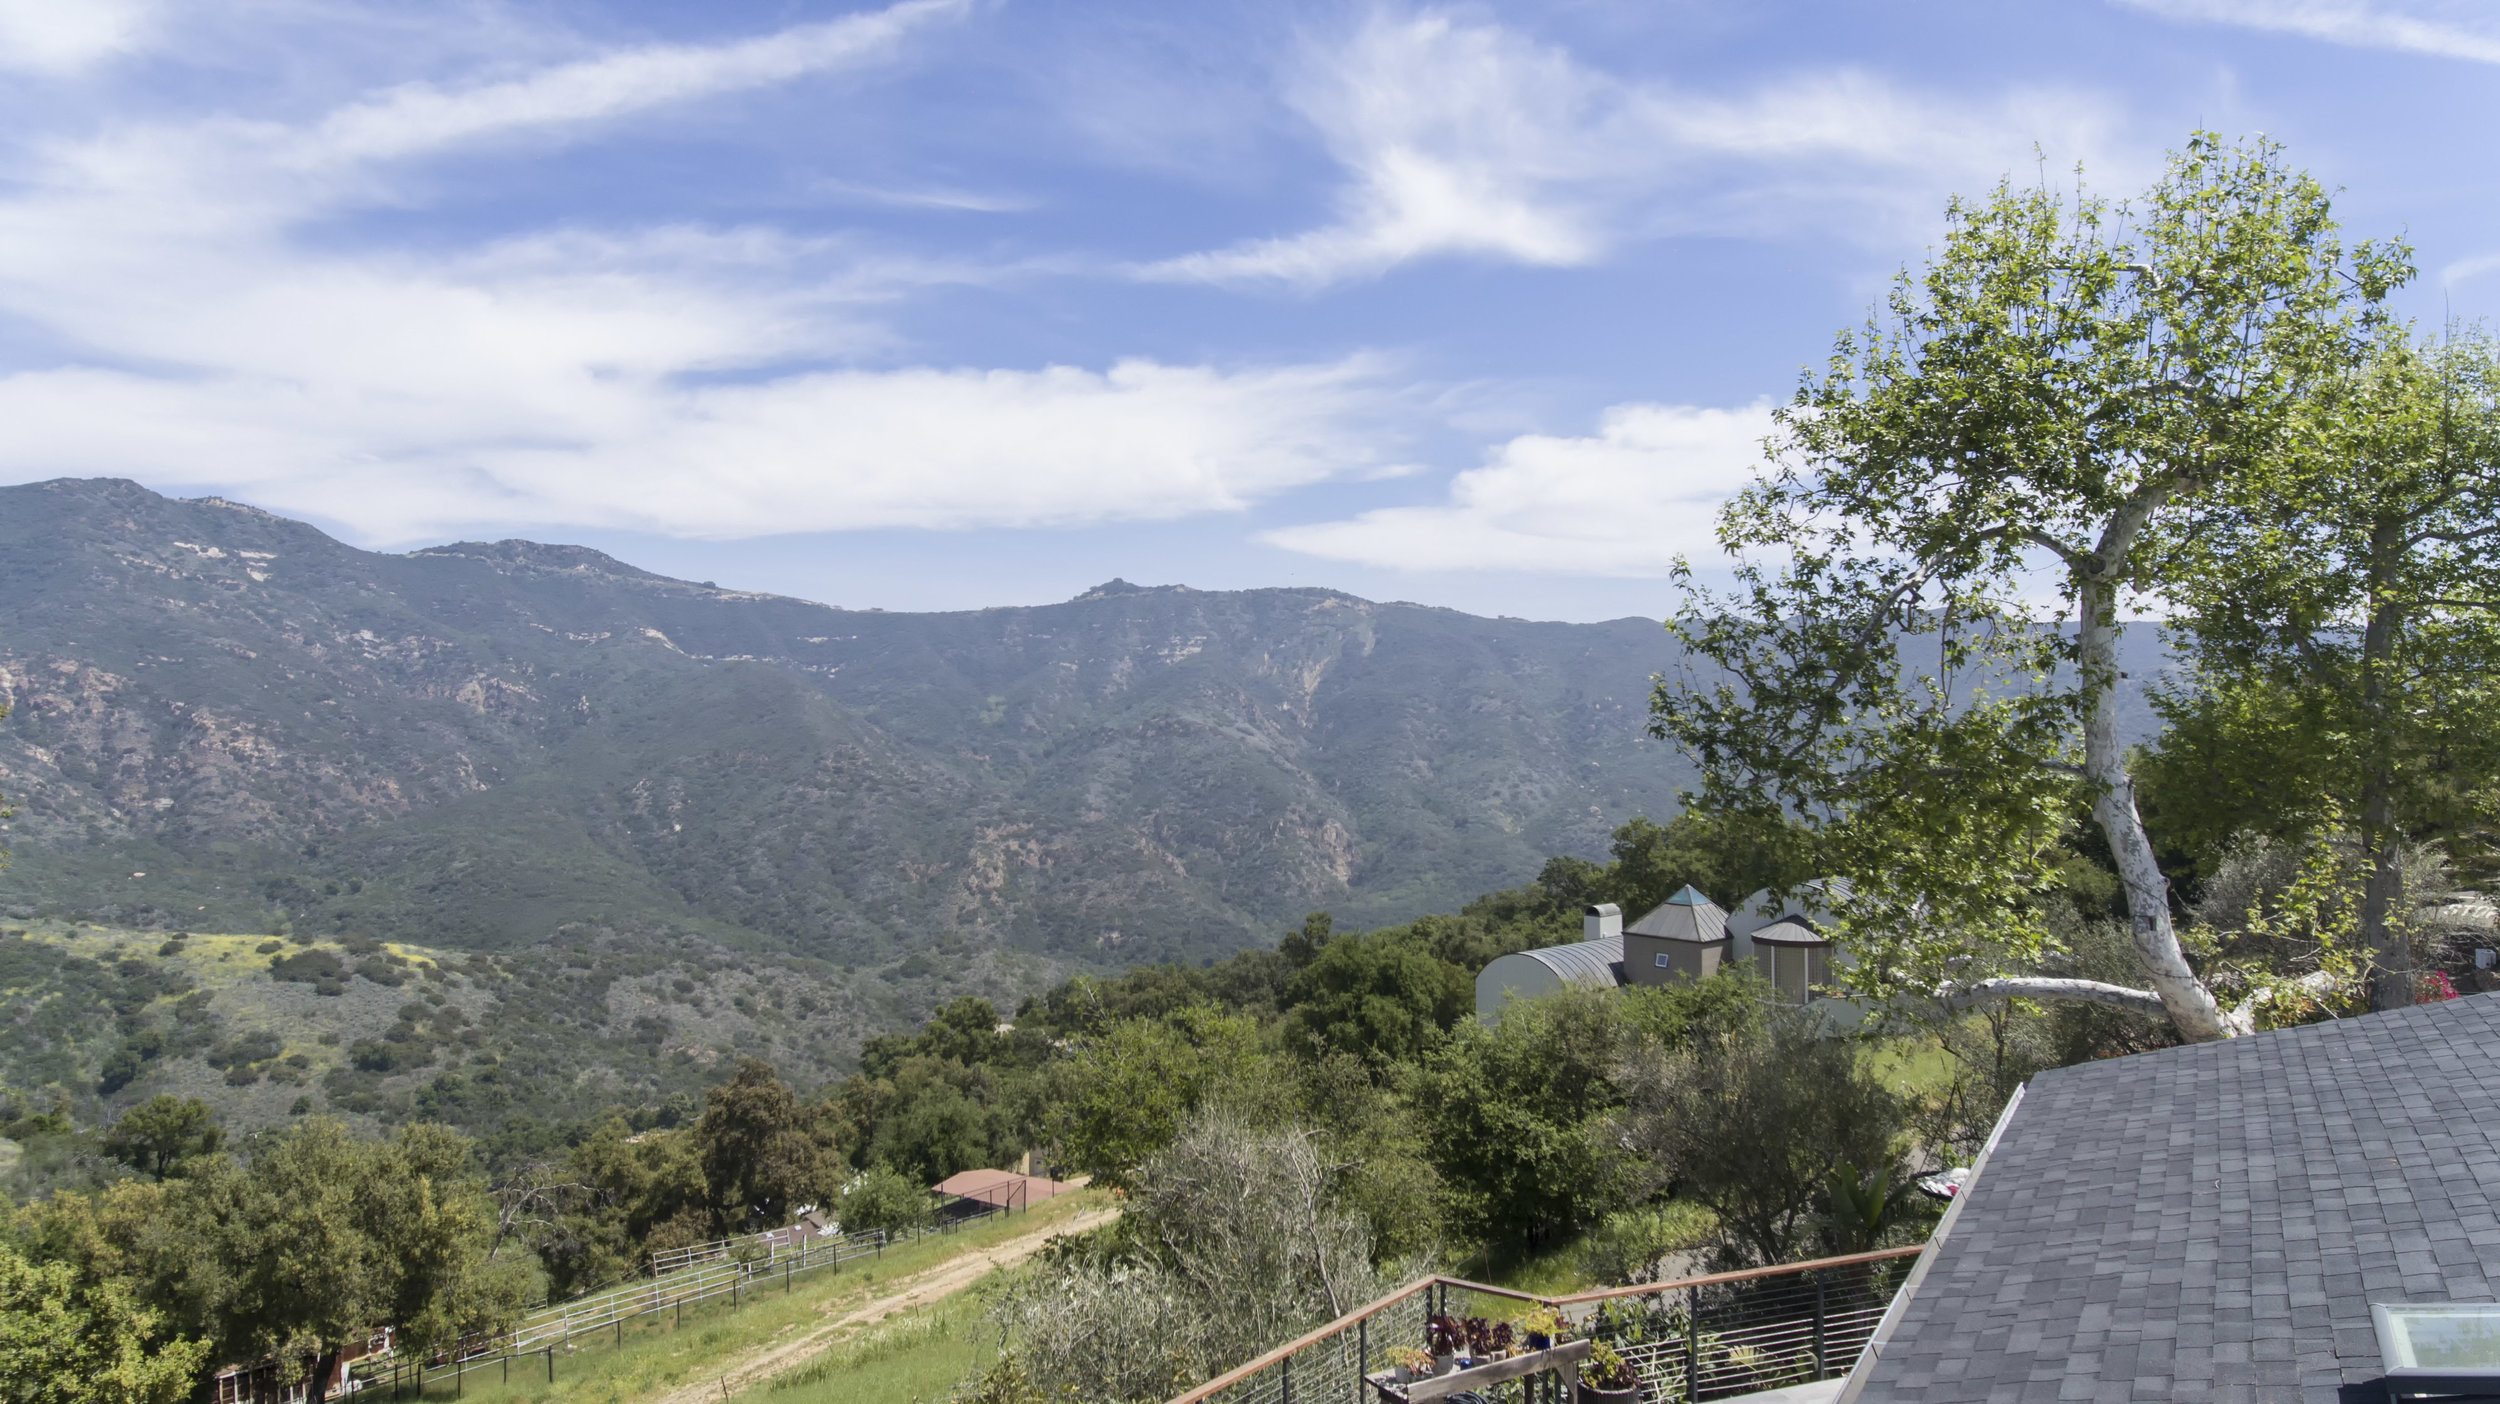 031 View 26272 Cool Glen Way Malibu For Sale Luxury Real Estate.jpg